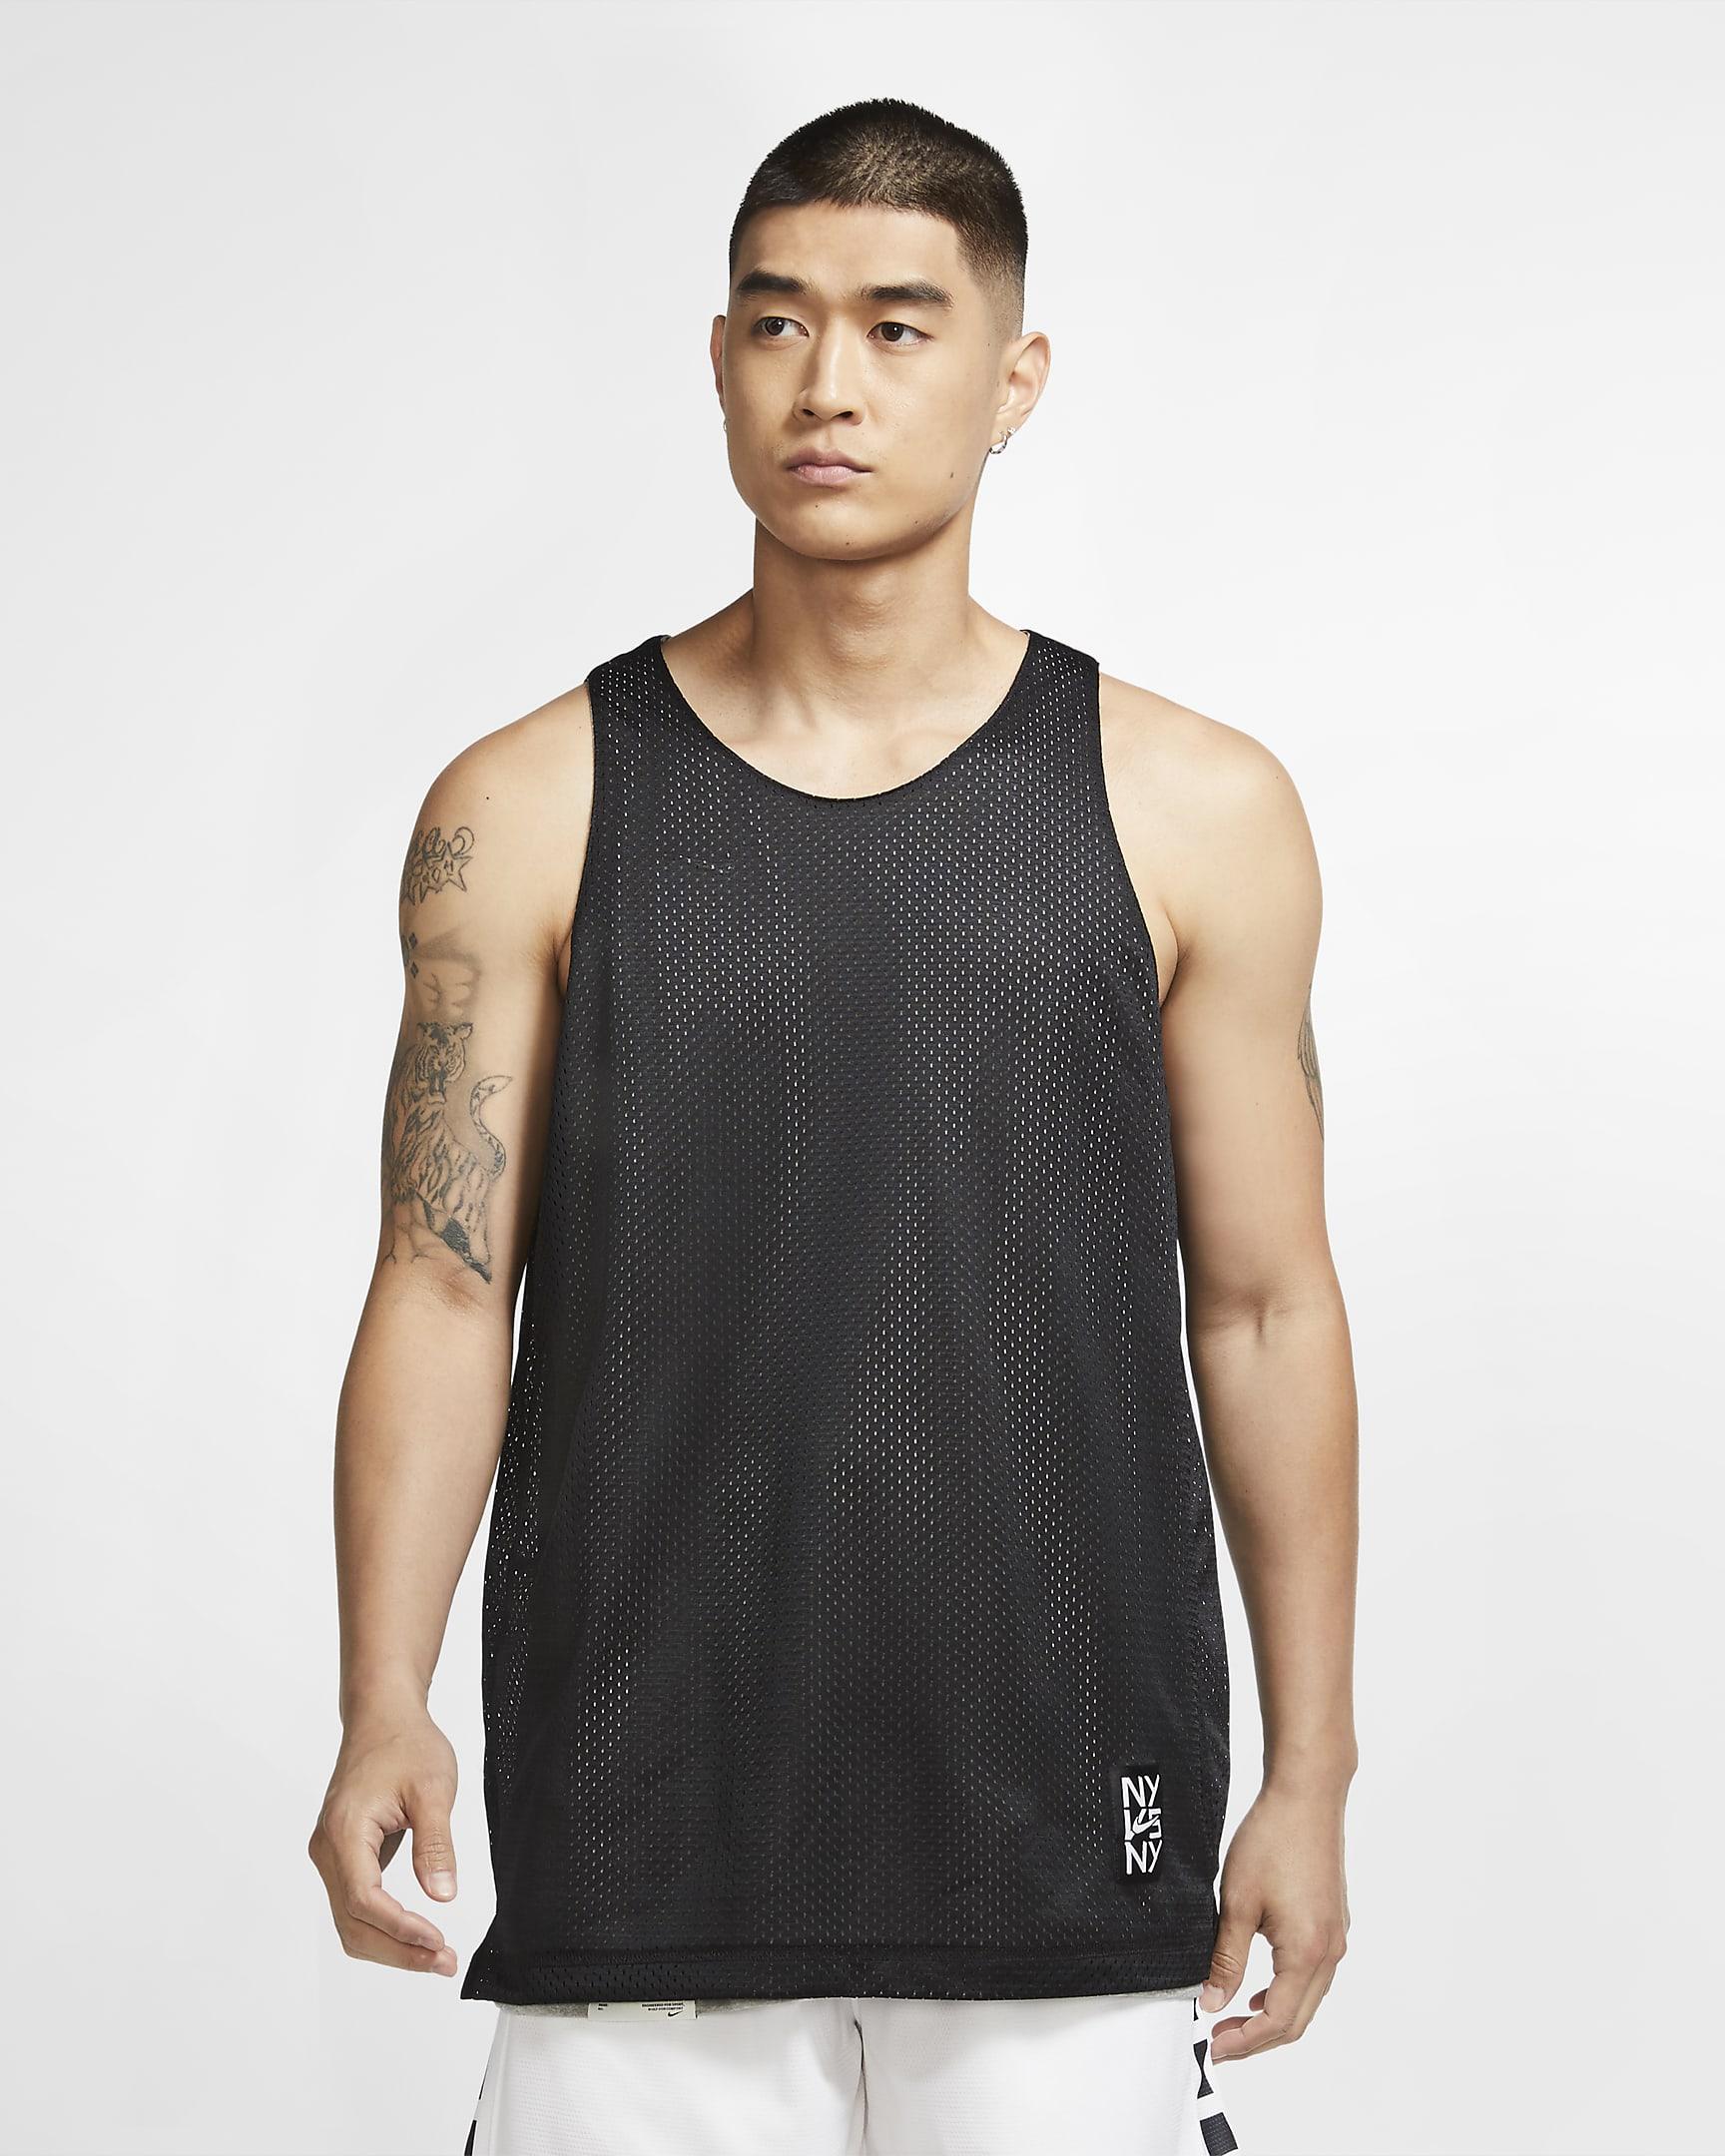 standard-issue-ny-vs-ny-mens-basketball-reversible-mesh-jersey-hbQngw.png